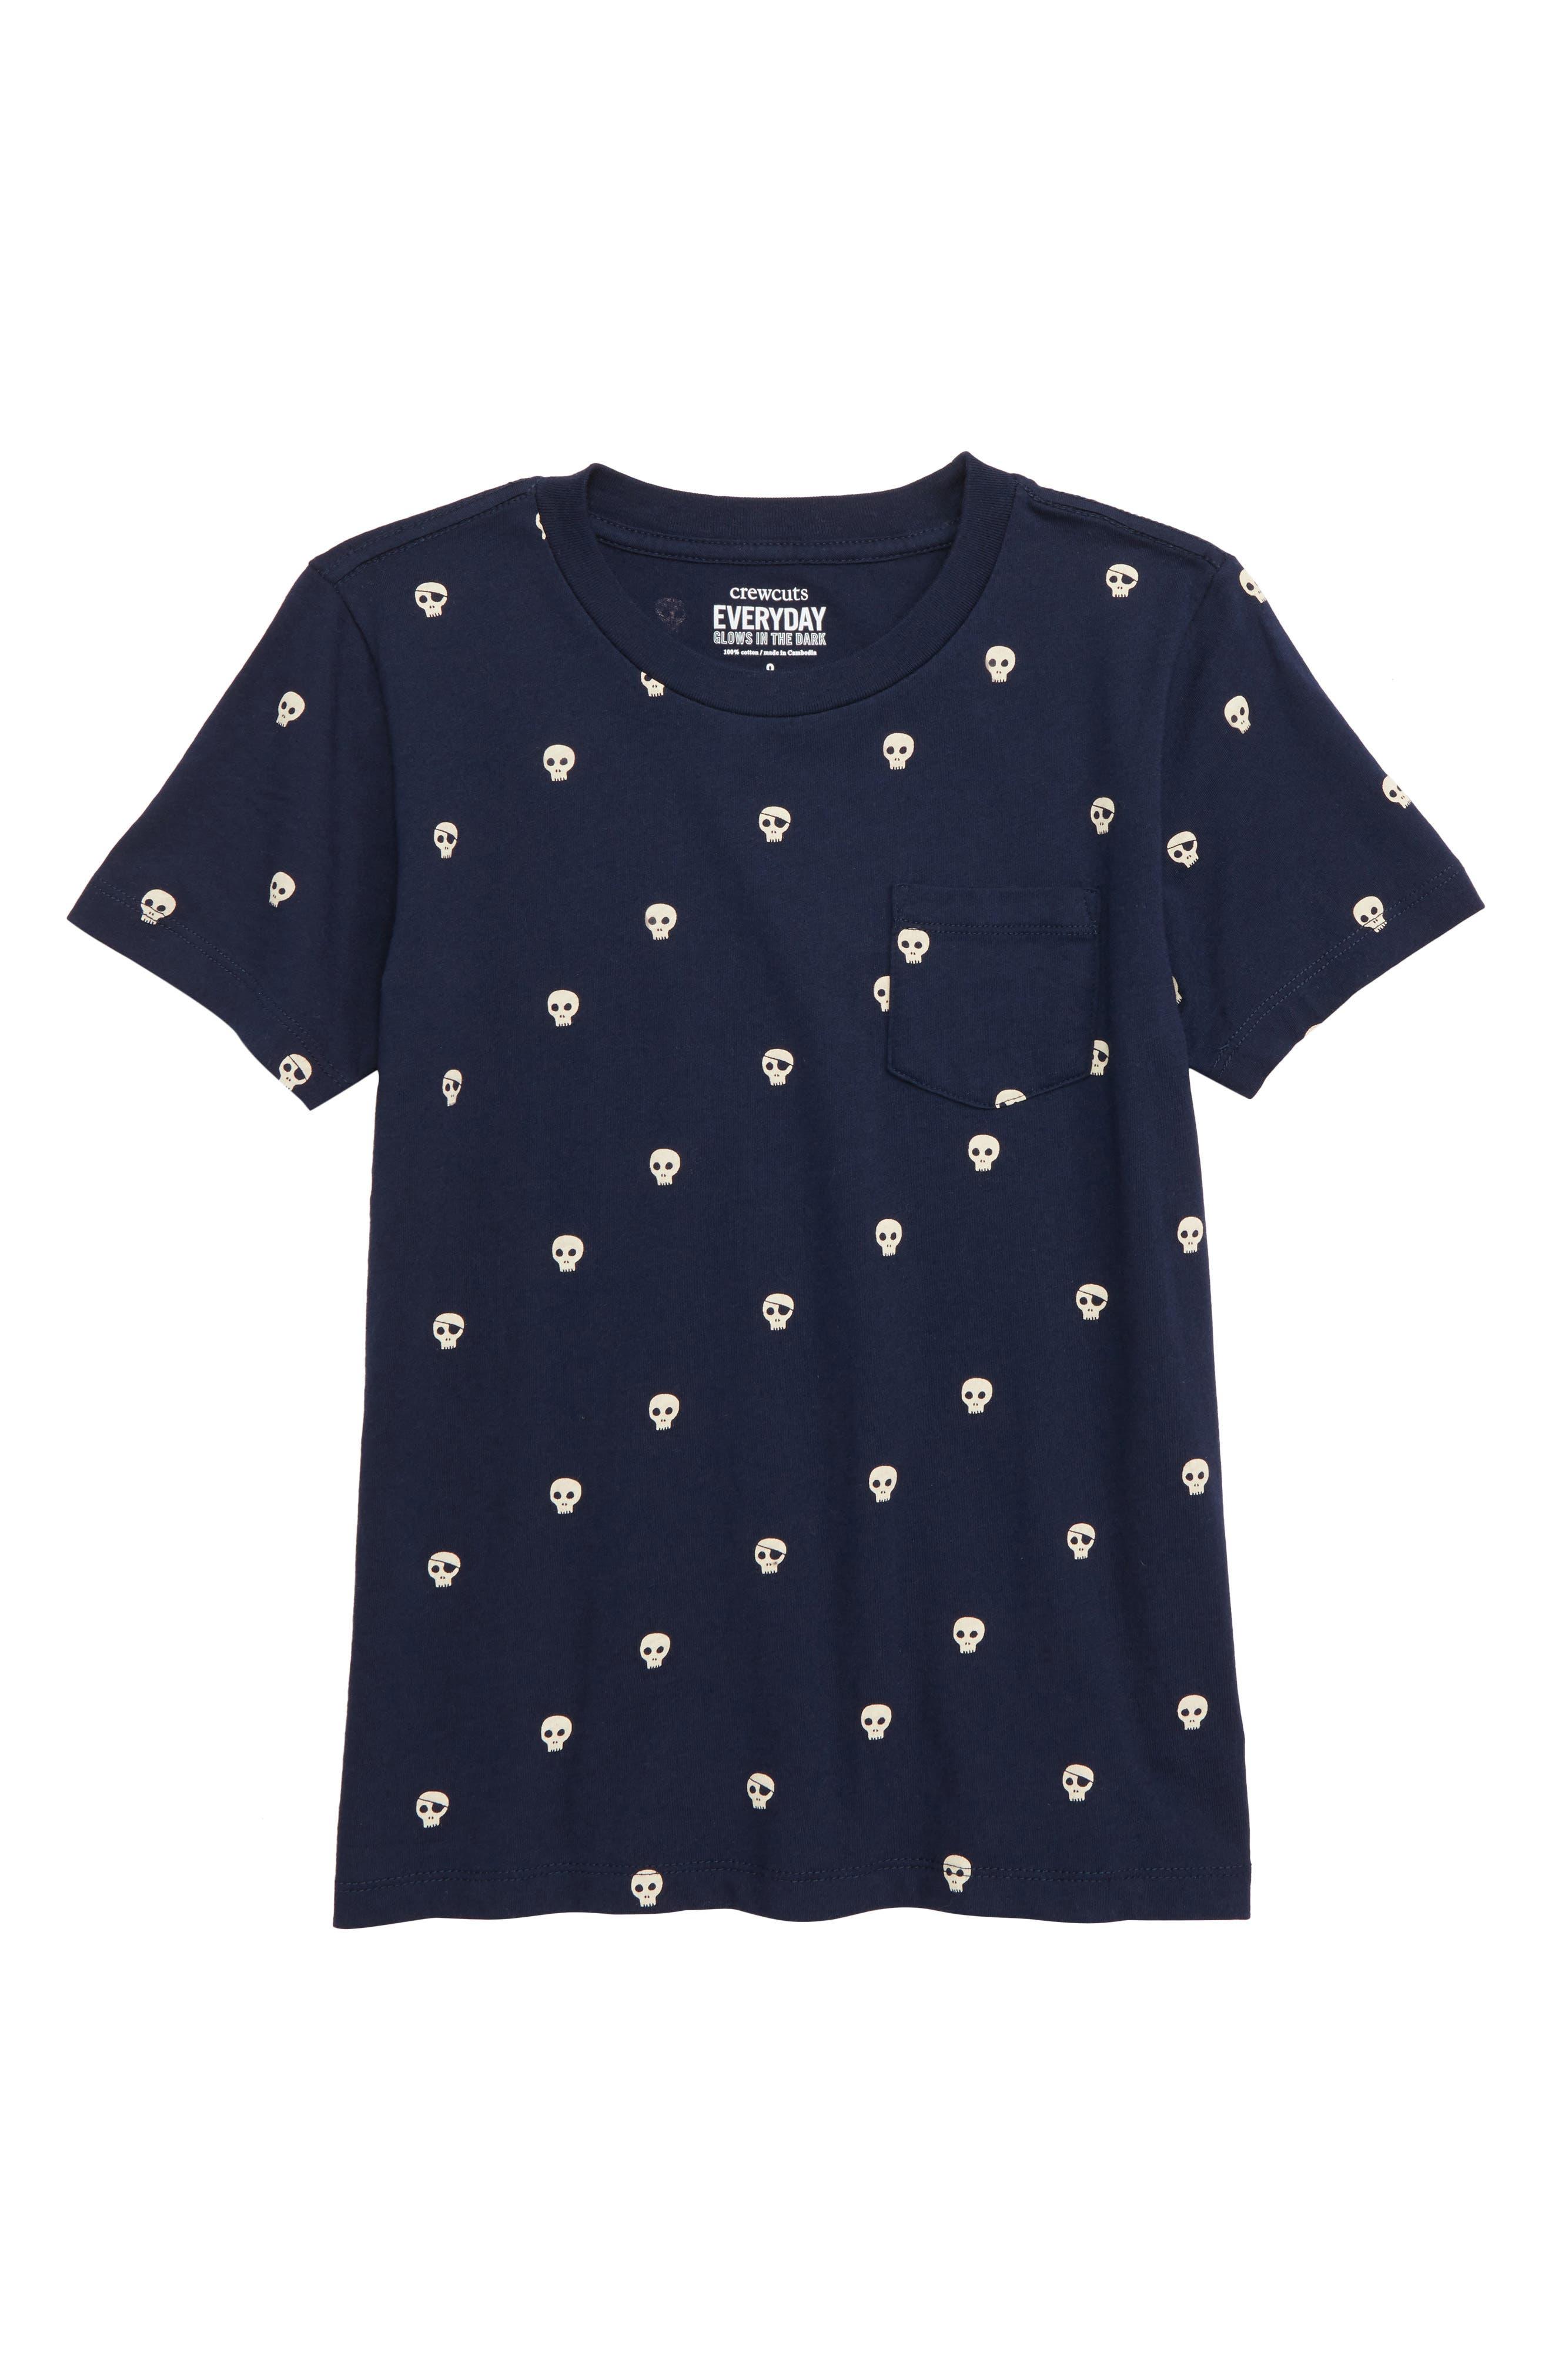 Pocket Glow in the Dark T-Shirt,                             Main thumbnail 1, color,                             NAVY